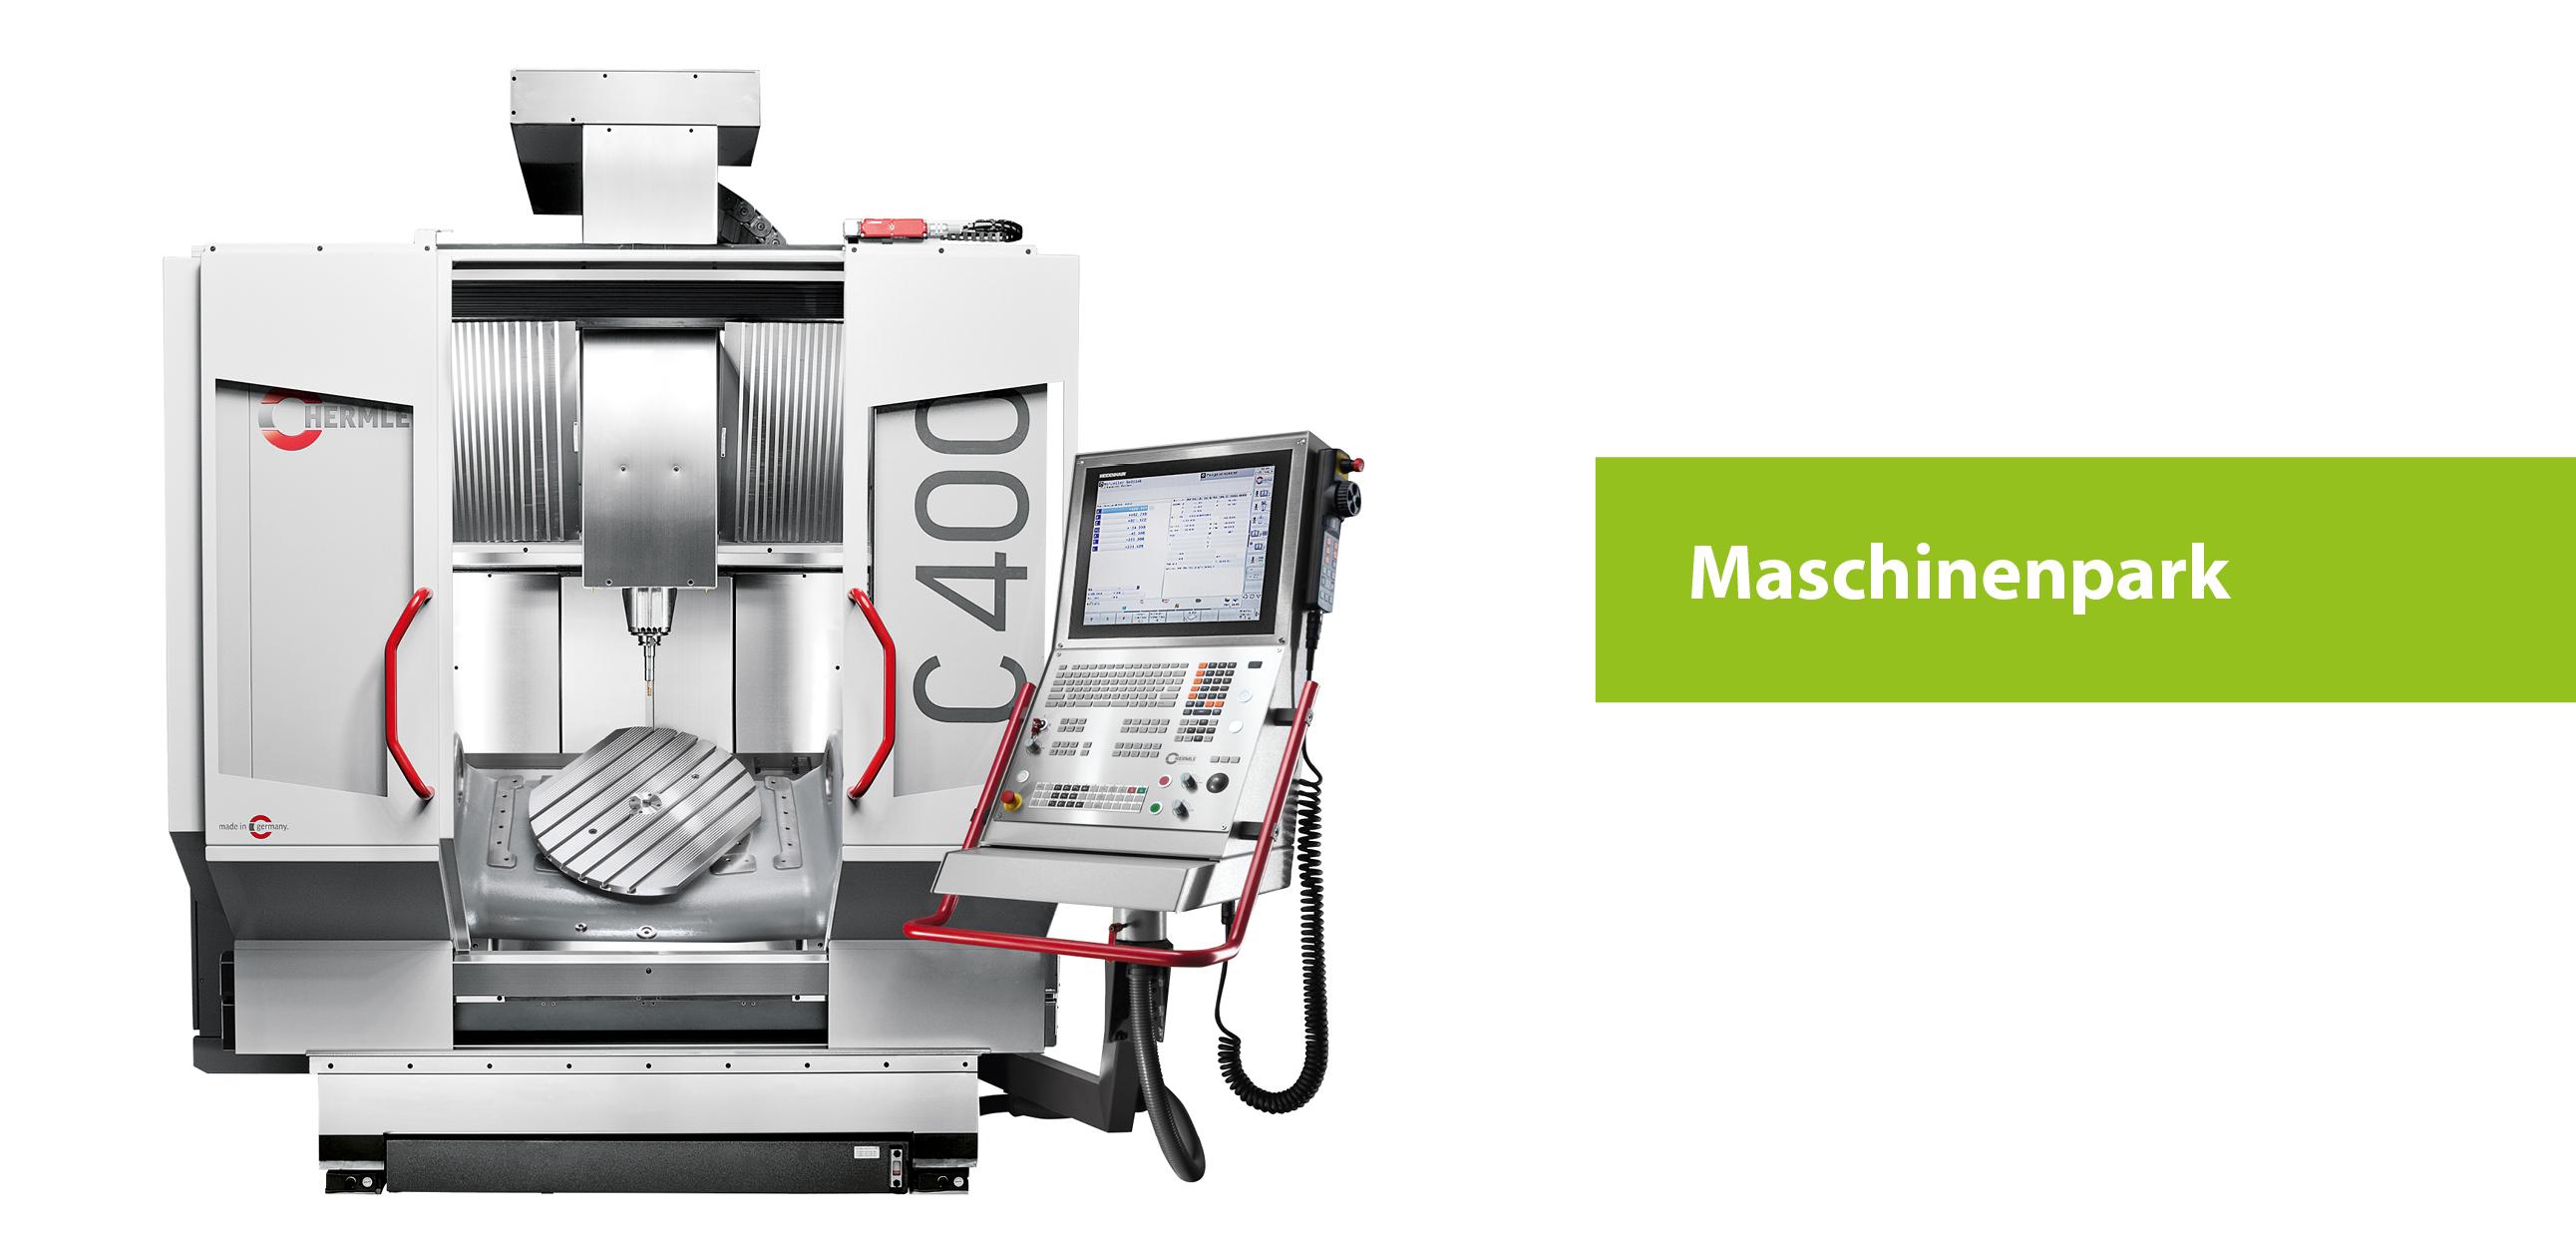 Maschinenpark_2019